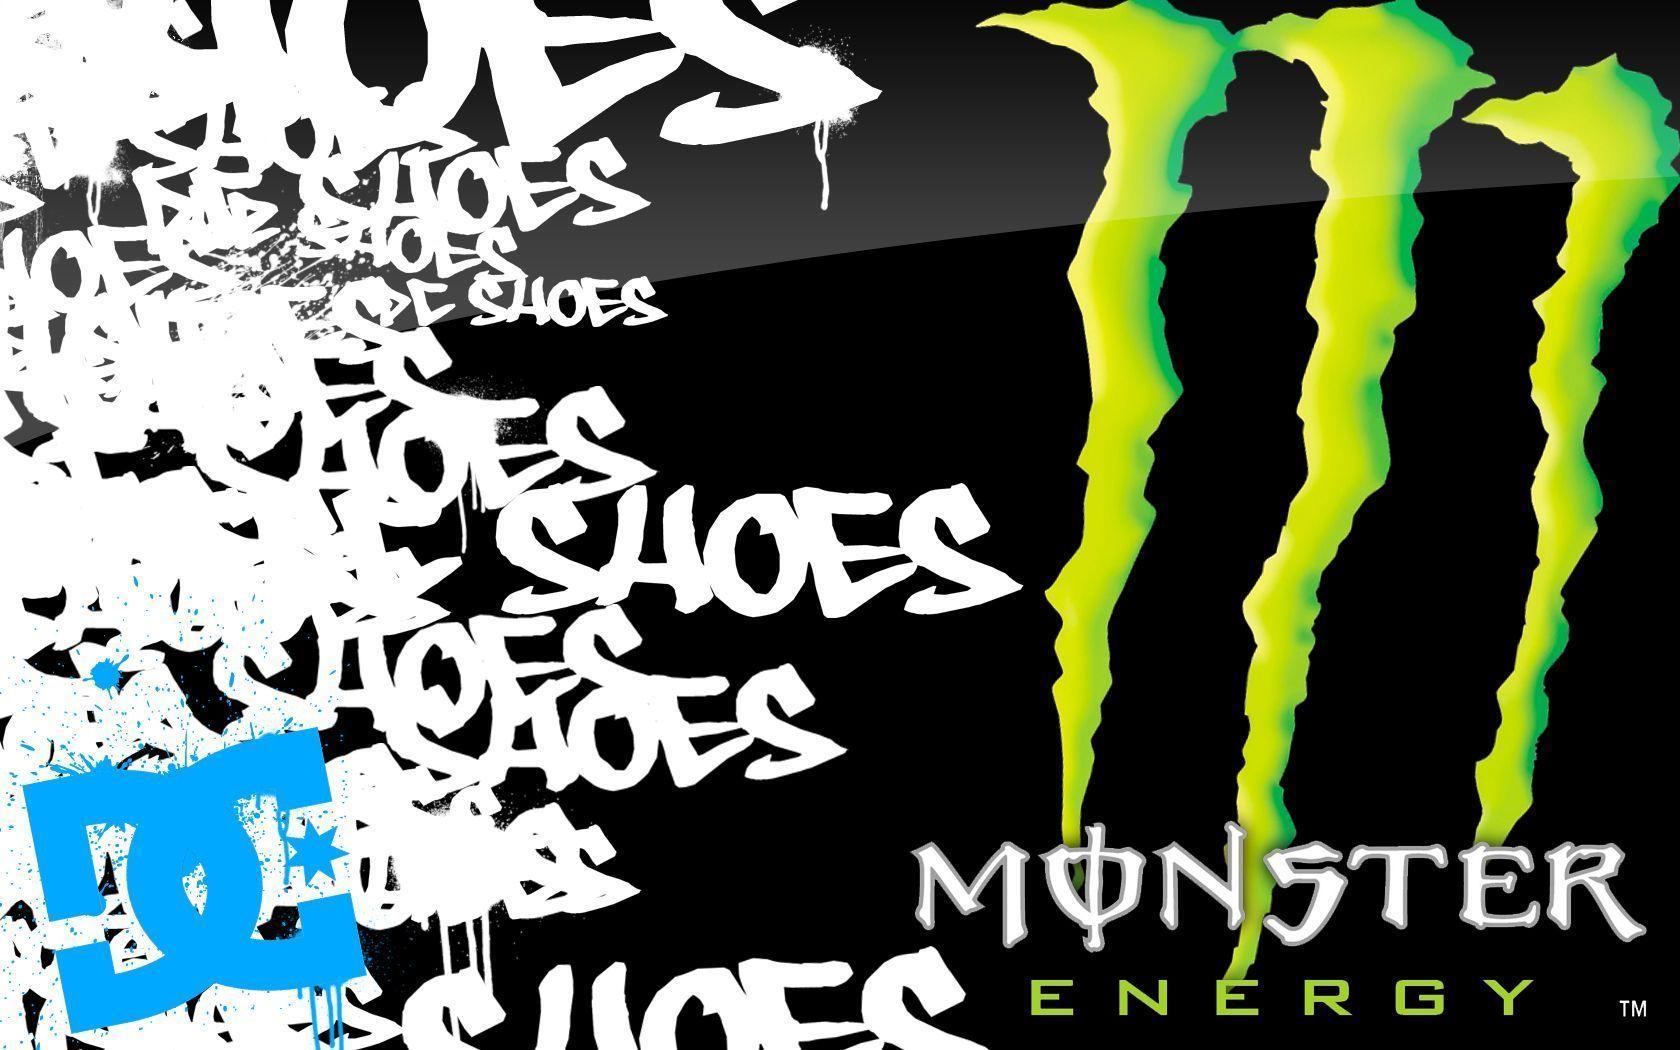 Bien-aimé Monster Energy Wallpapers HD - Wallpaper Cave UB36